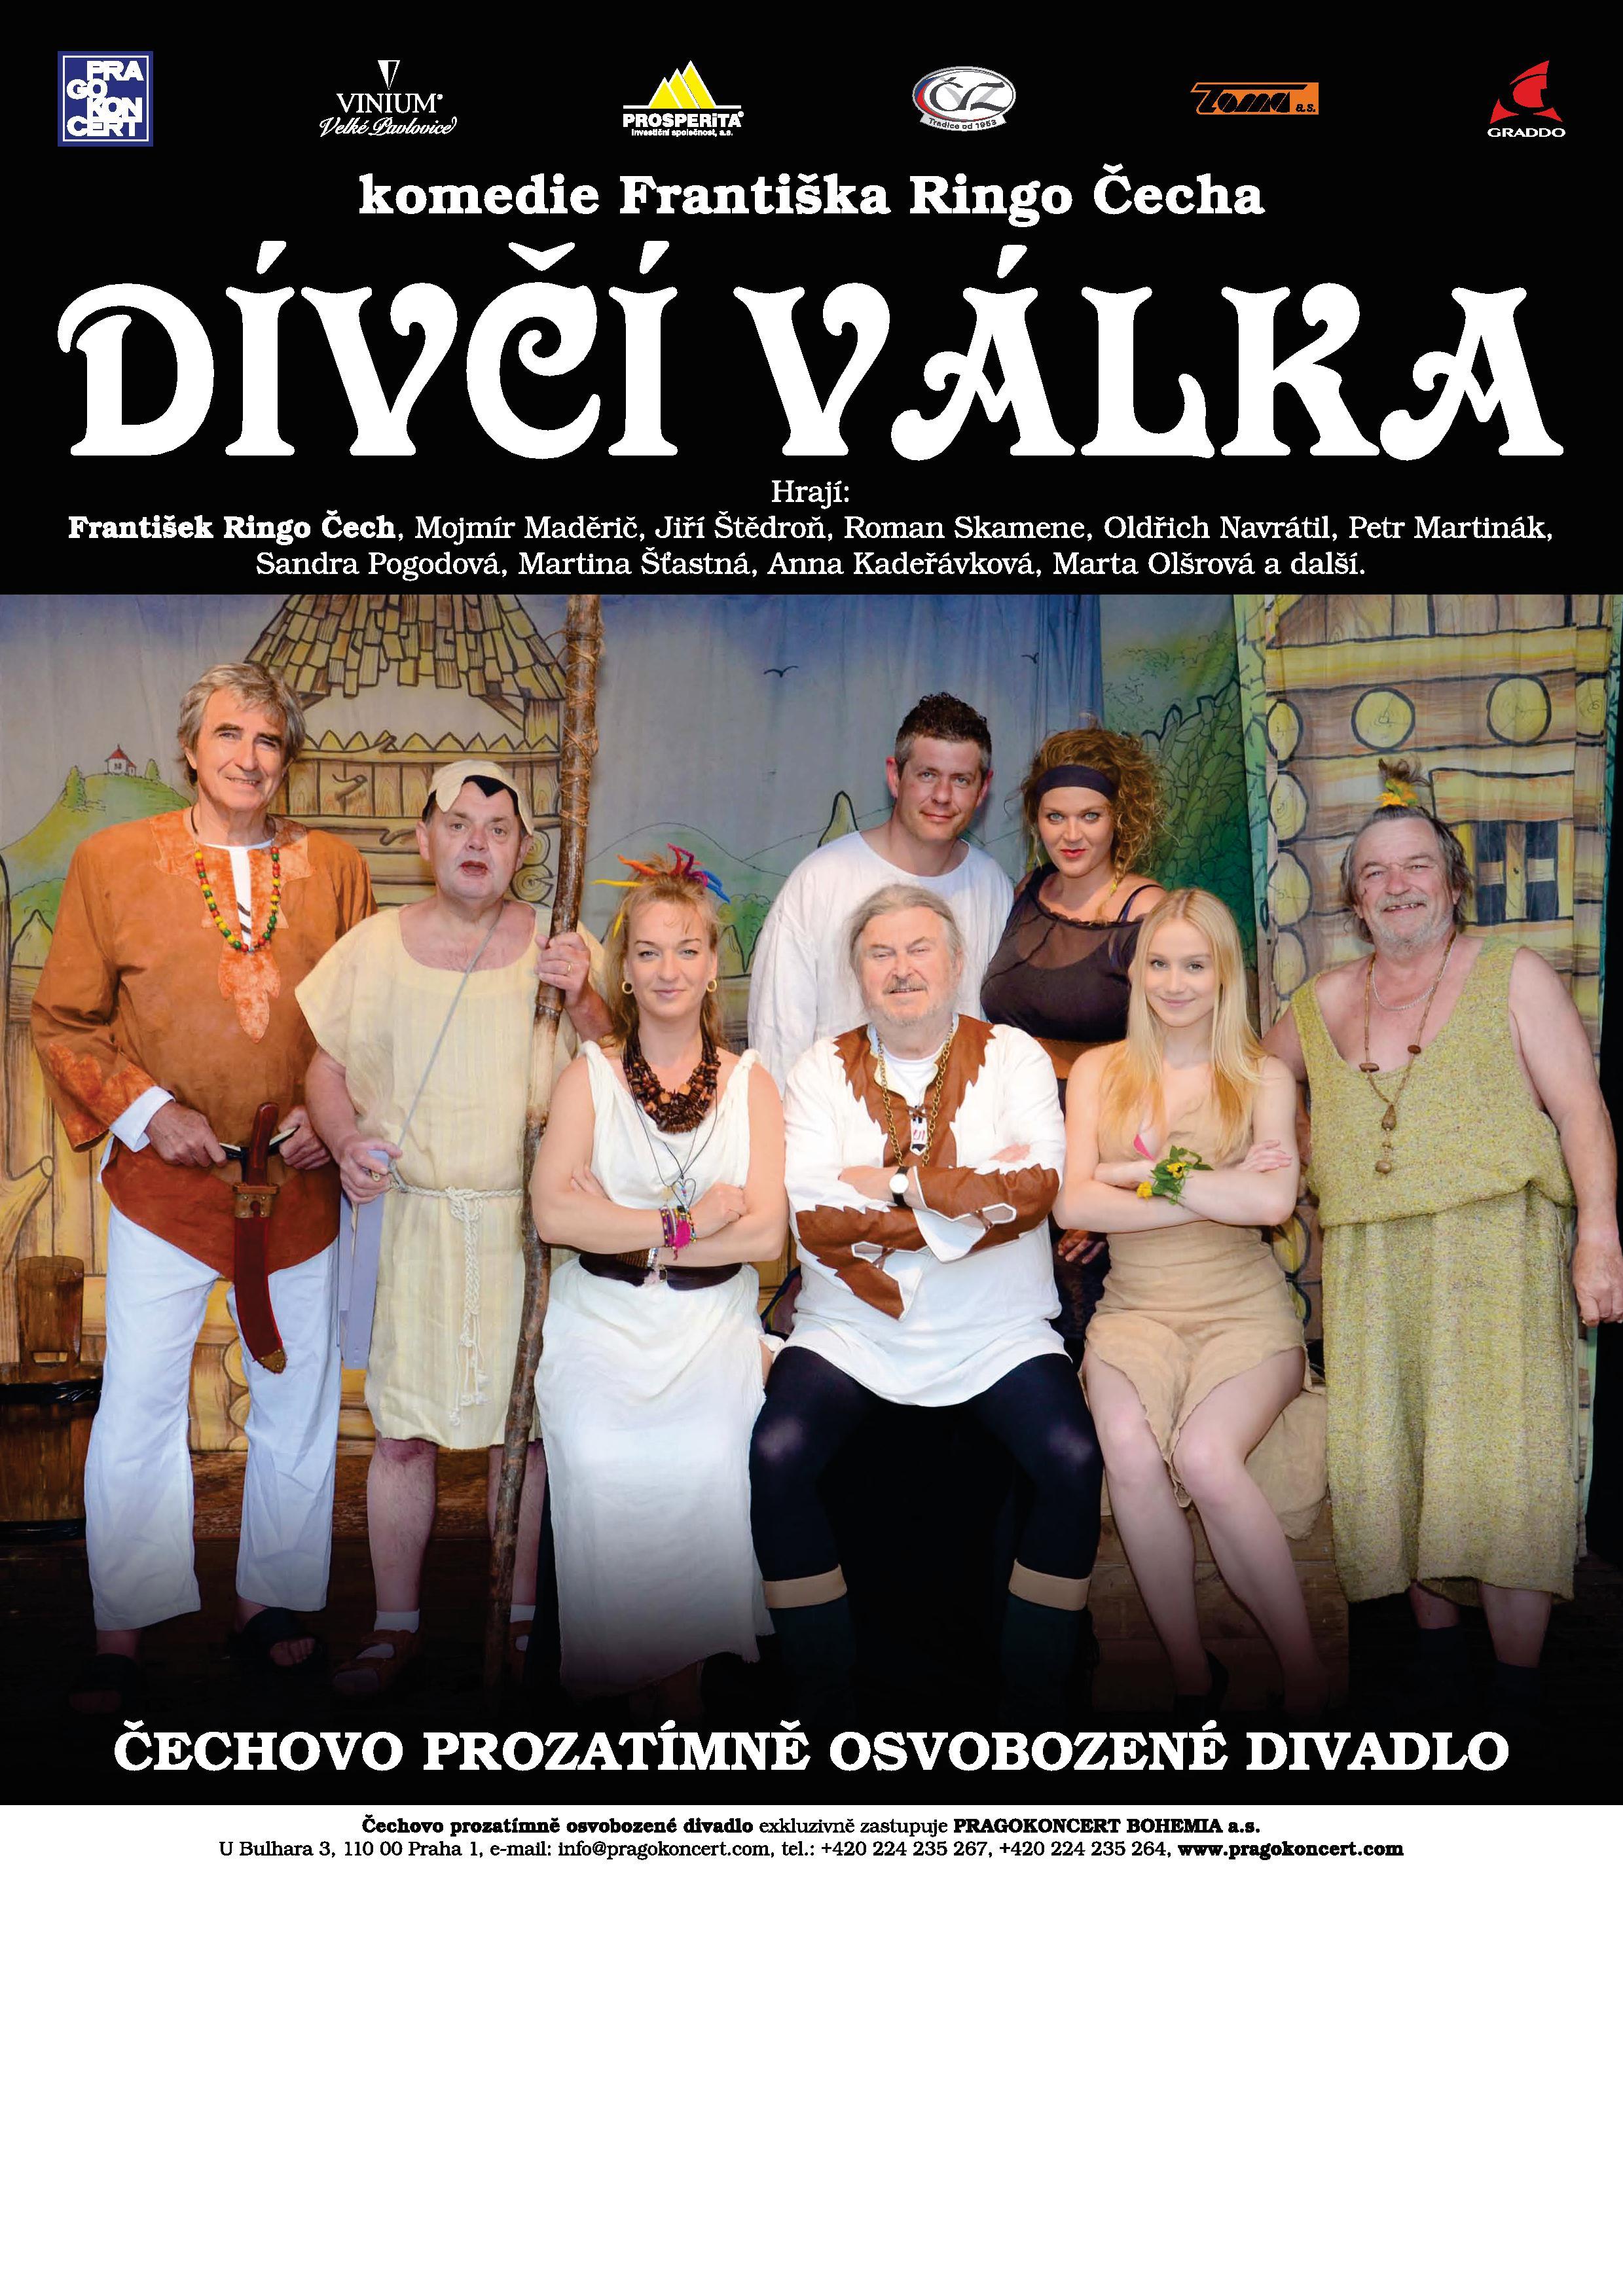 1971-divcivalka2015-a2-nahled.jpg